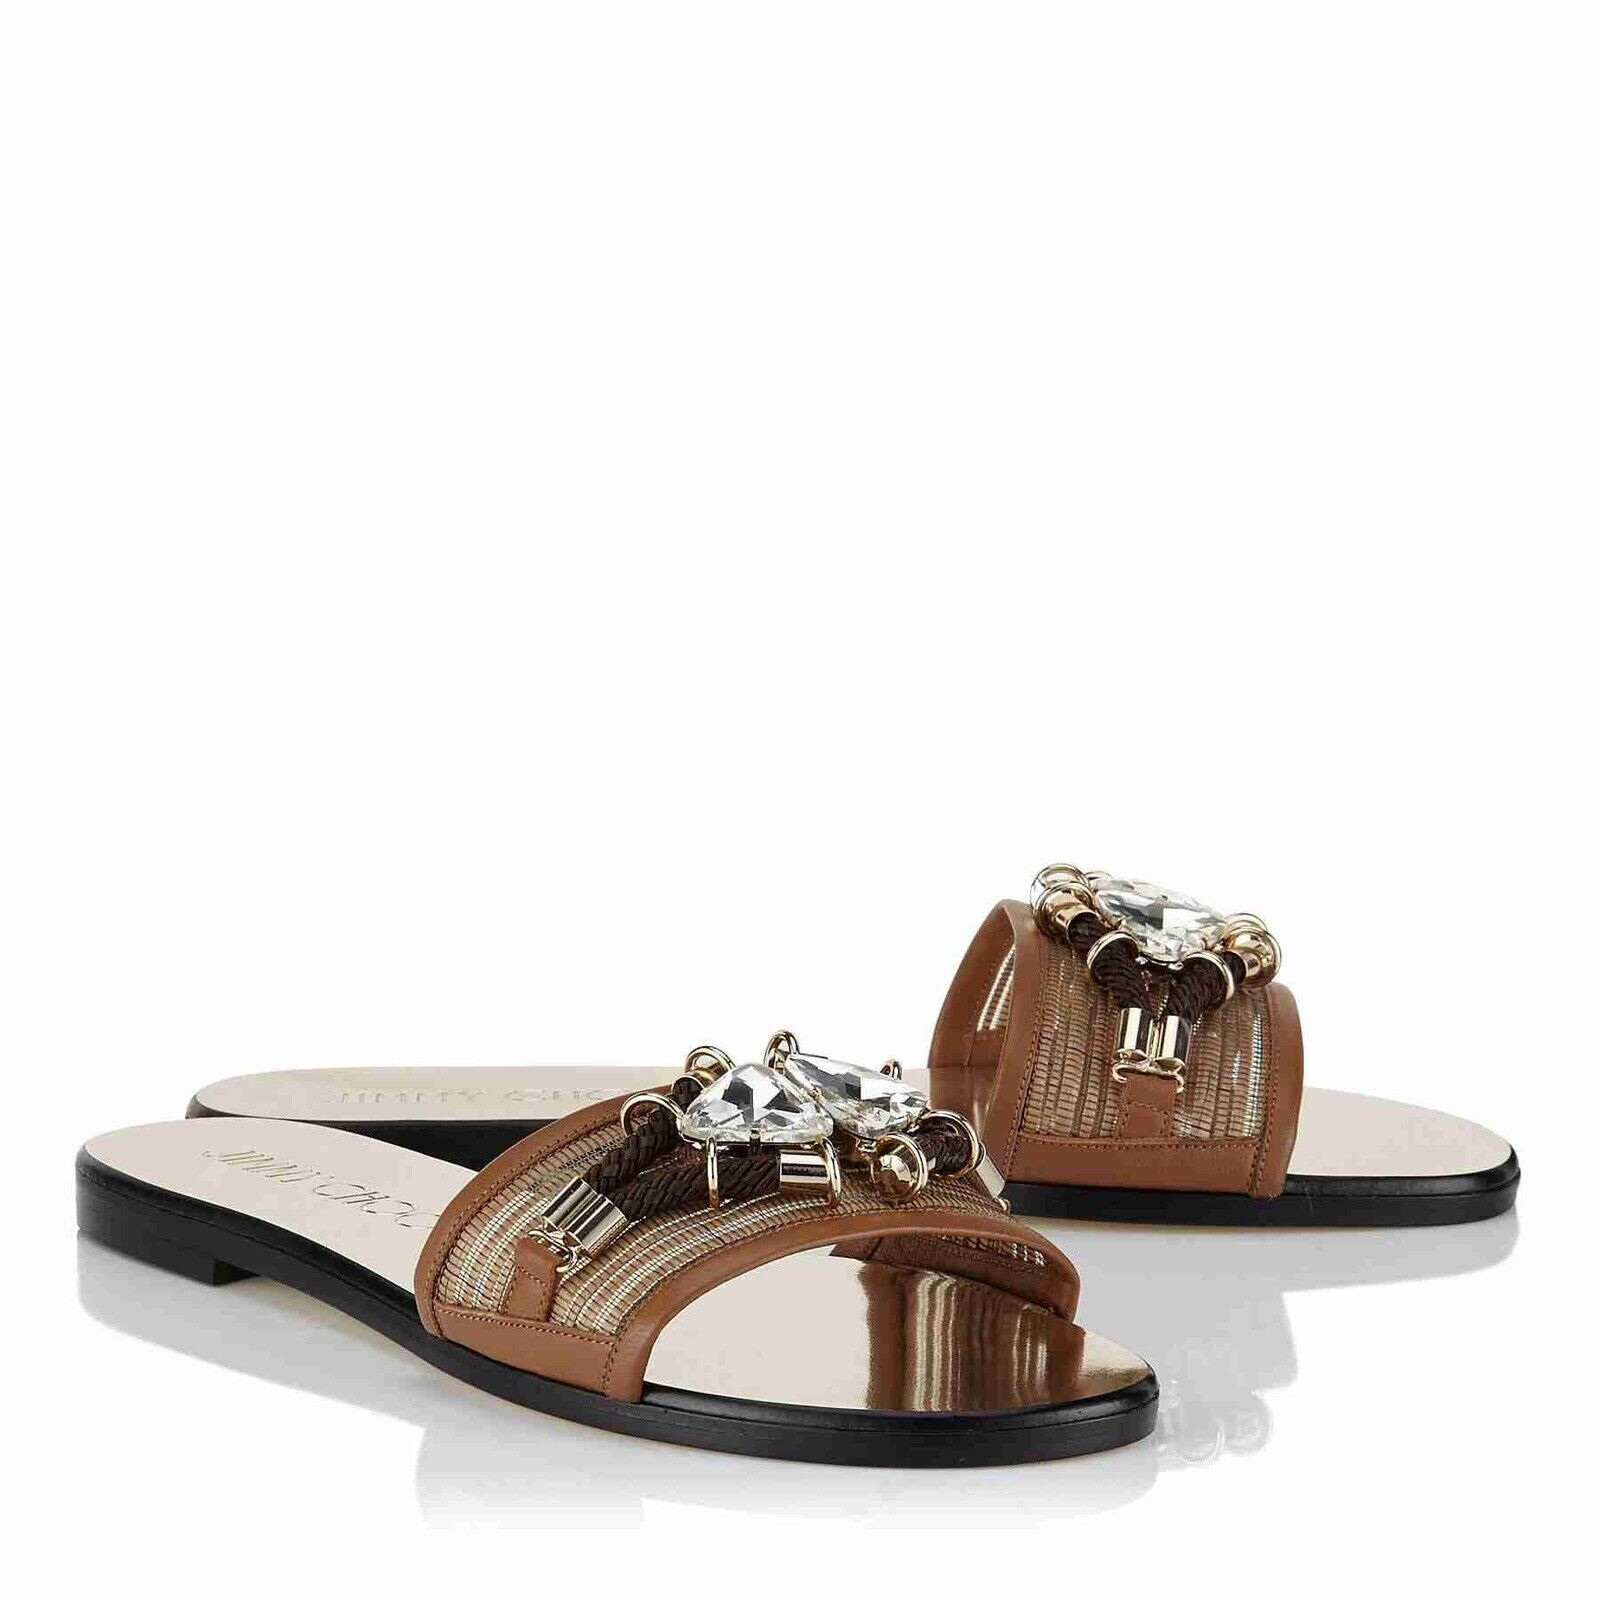 JIMMY CHOO 'Whisp' Tan Canyon Leather Slide Sandals Mules Größe Uk 2.5 Eu 35.5